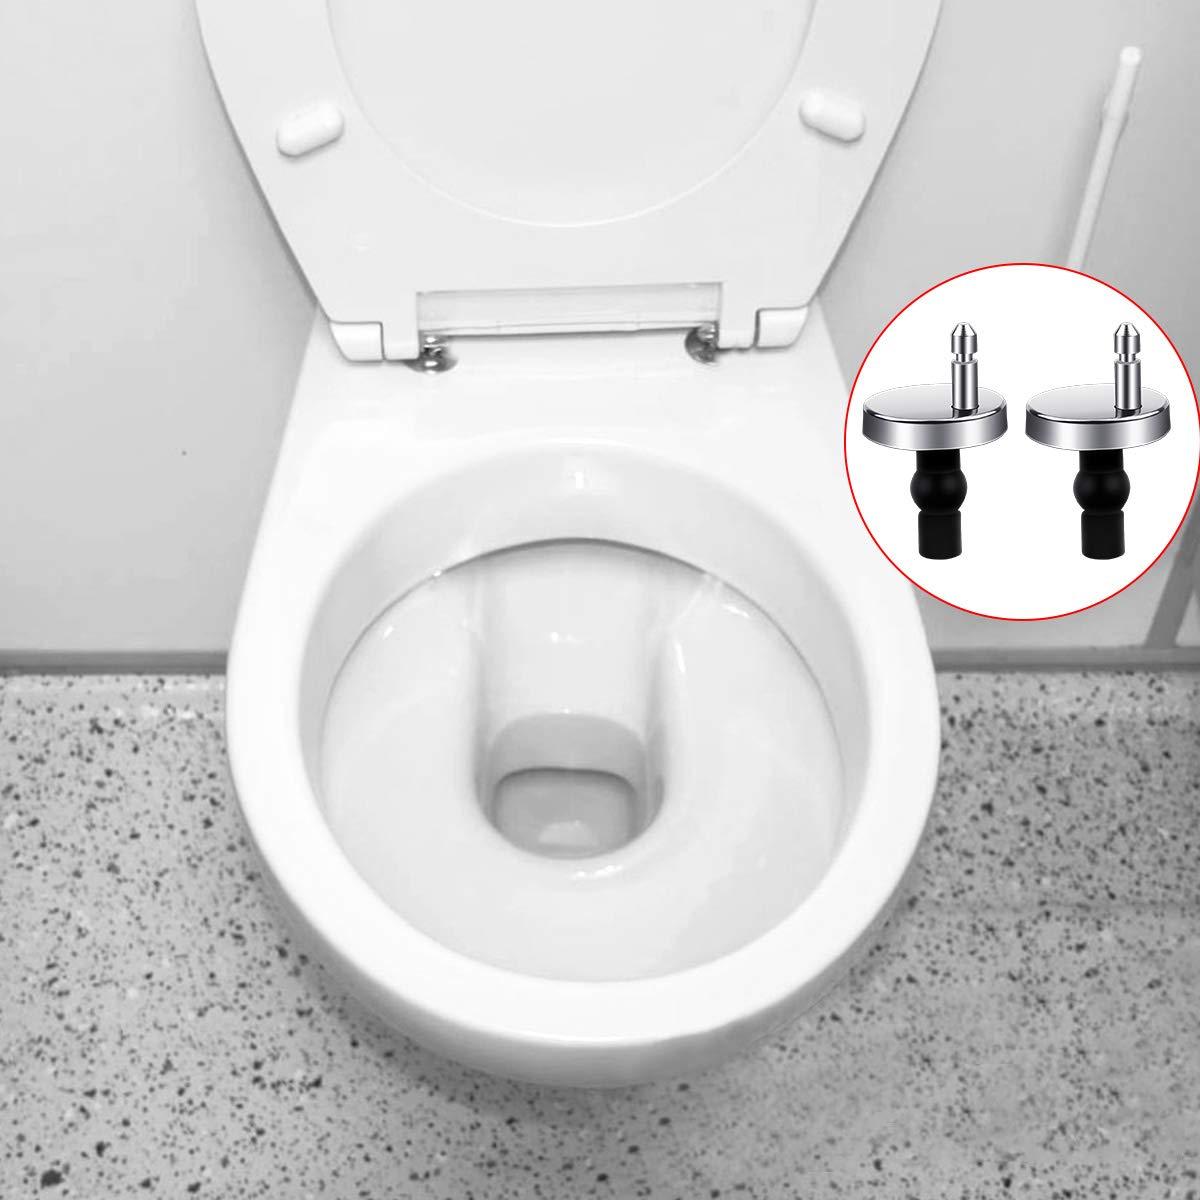 1 paio raccordi e accessori per sedili WC regolabili in lega di zinco cerniere cromate rifinite per sedili WC in resina di legno 2 pezzi